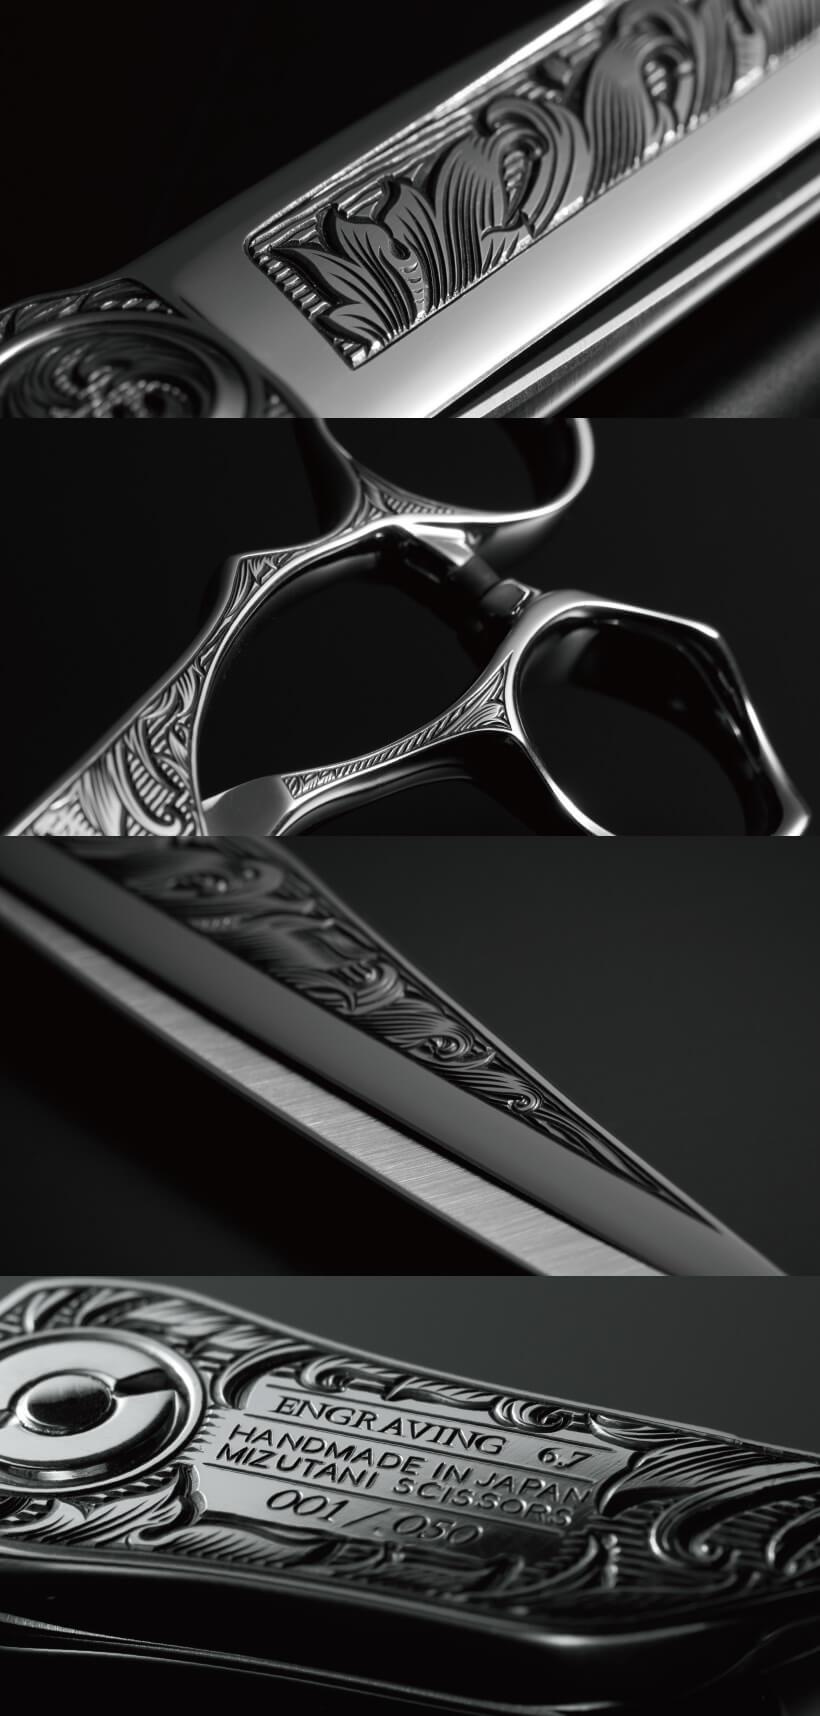 SWORD ENGRAVING MODEL